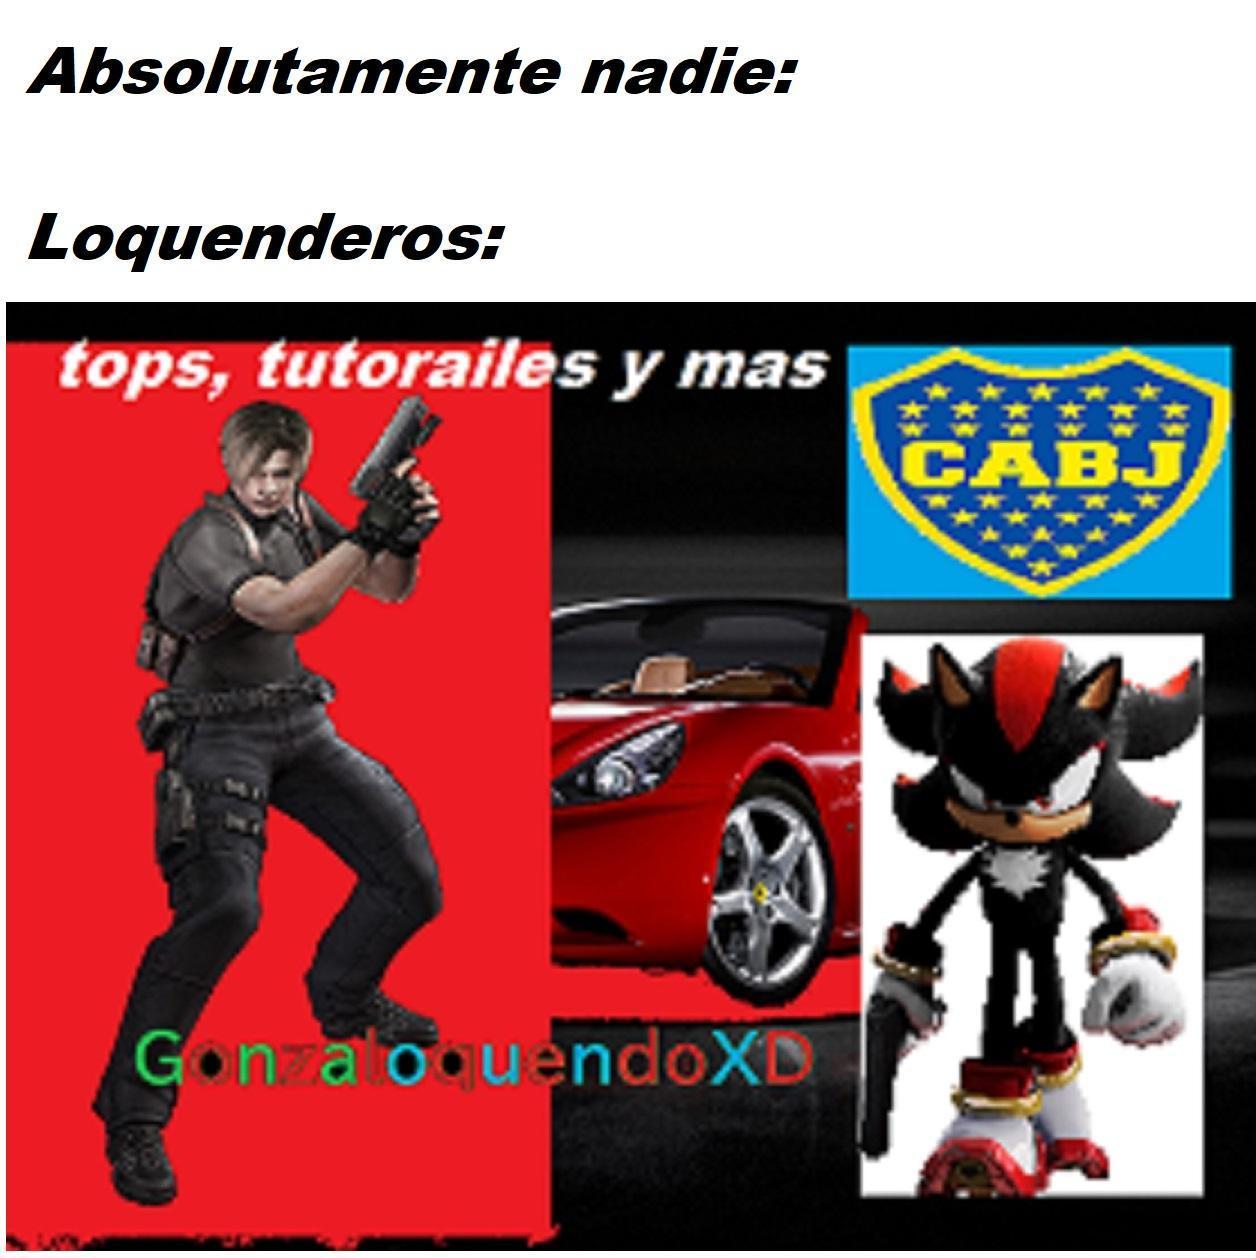 And yet ,El Mariachi - meme